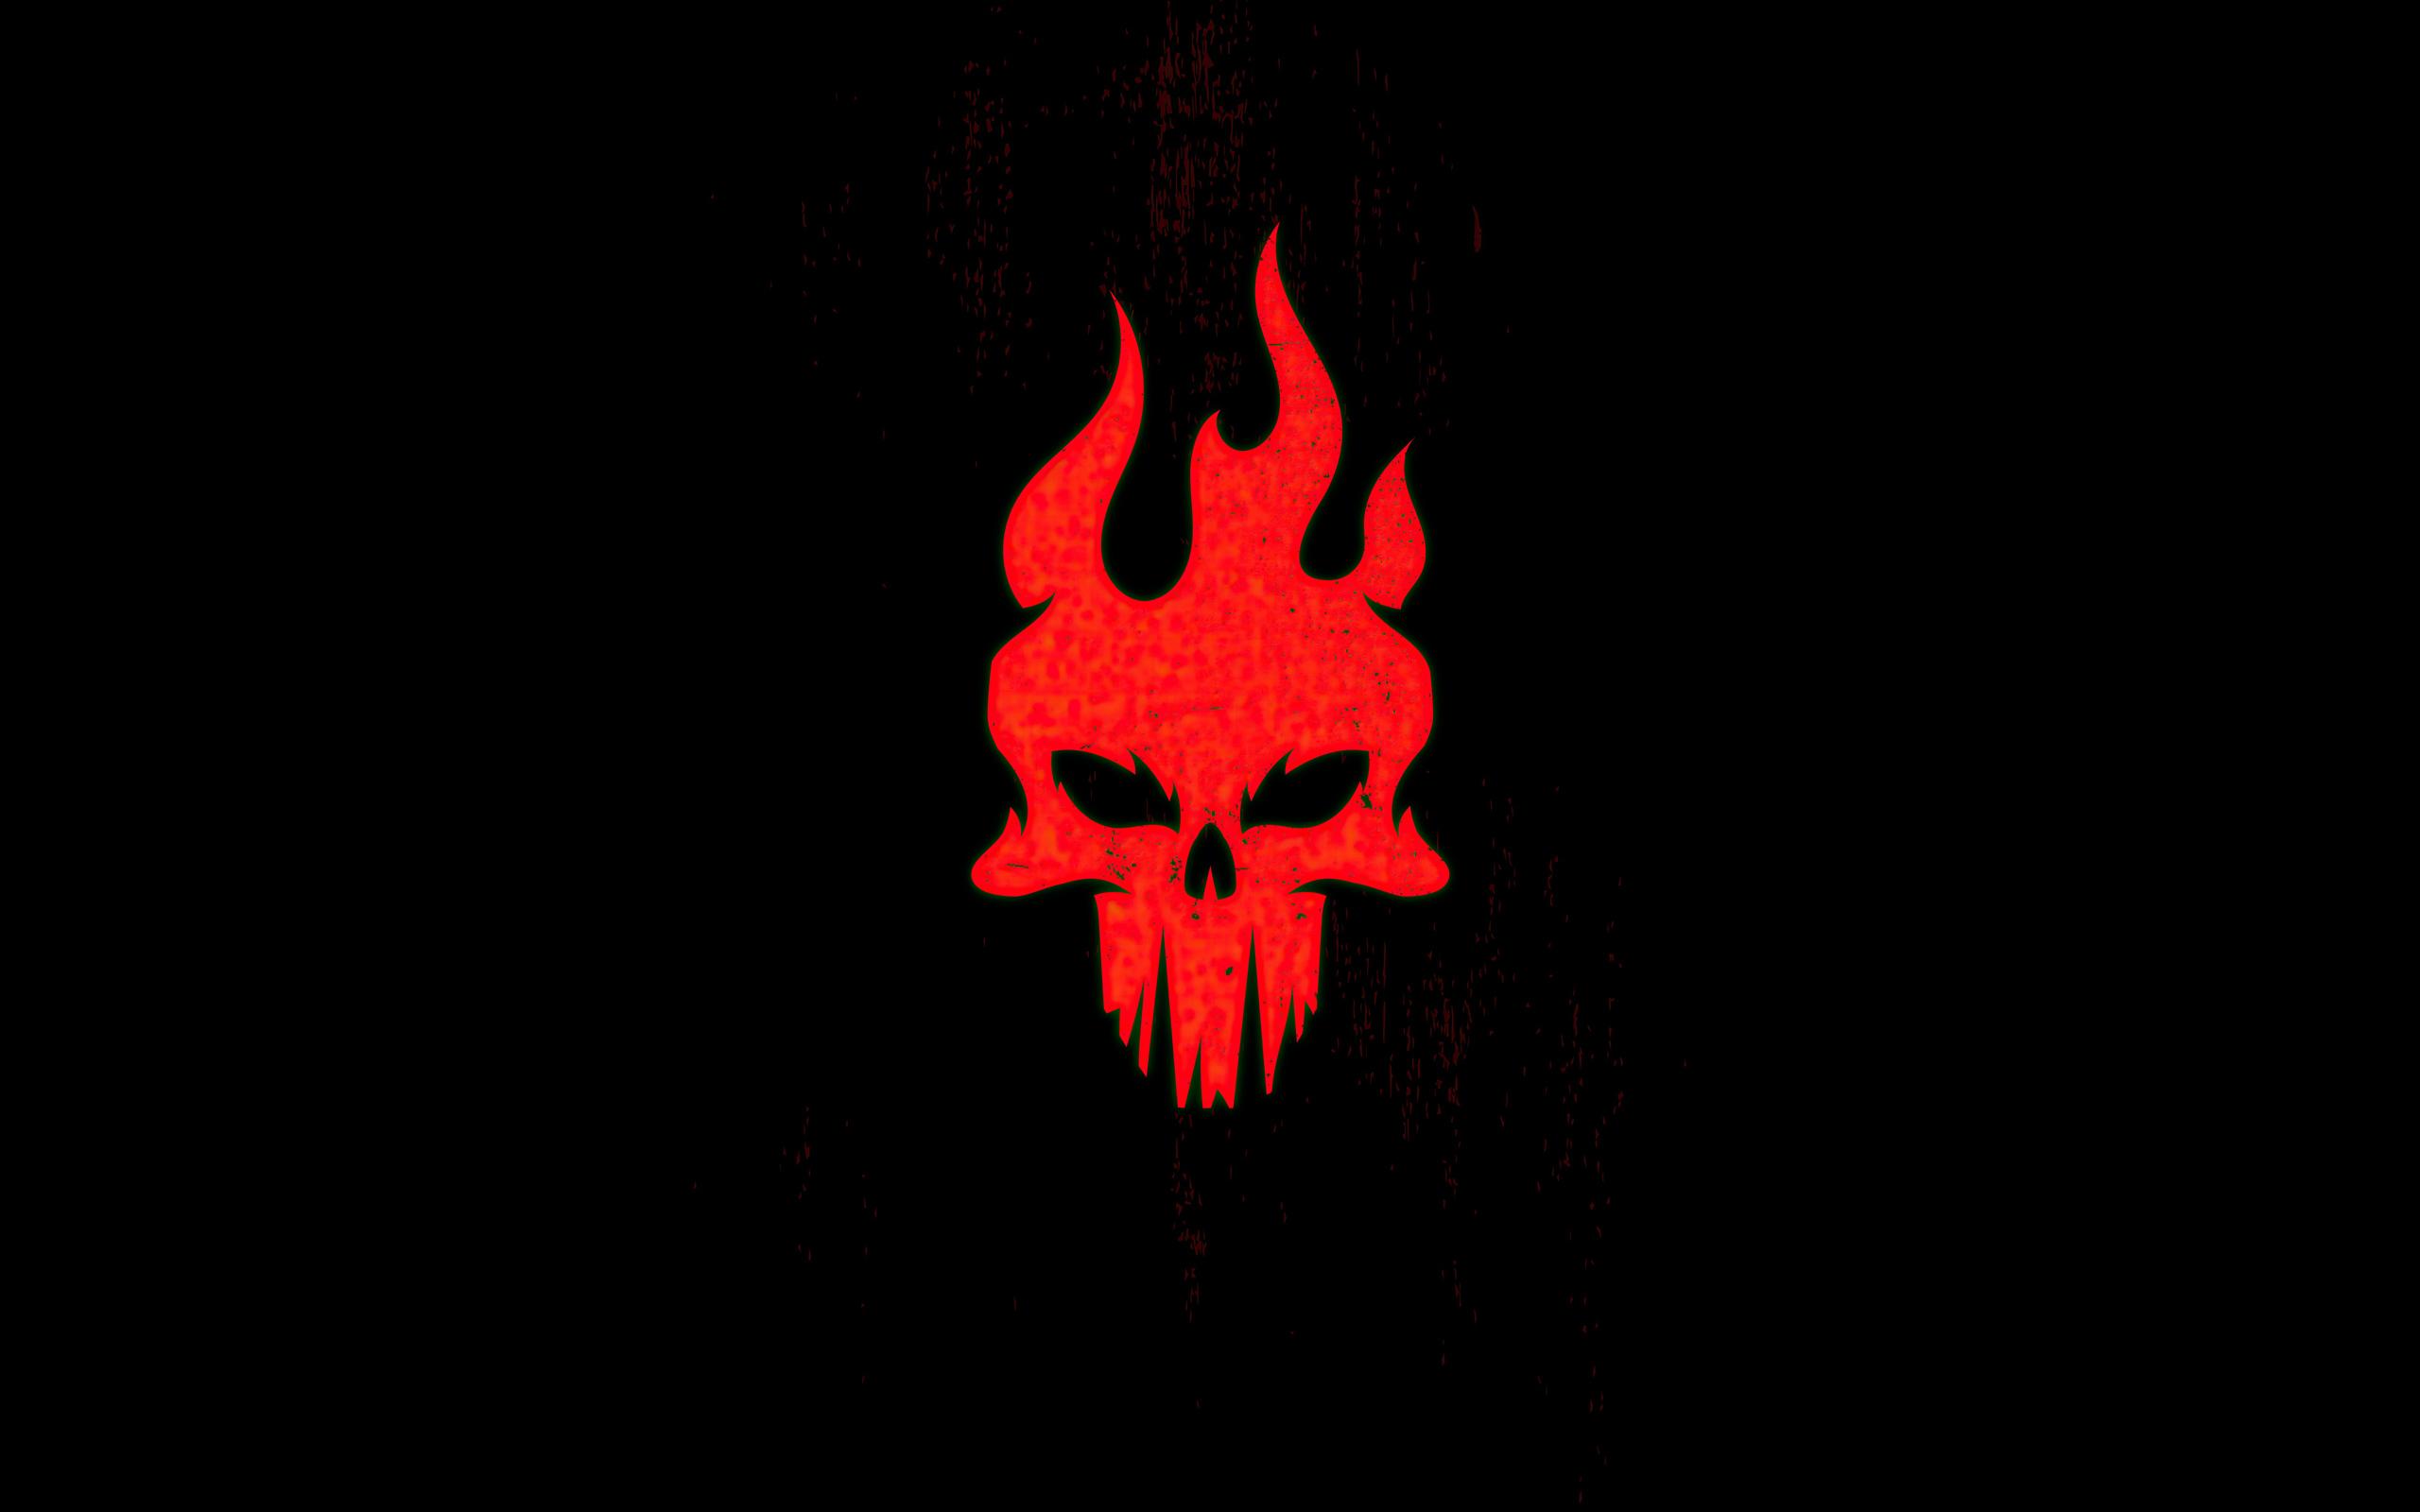 red-skull-minimal-light-4k-ft.jpg